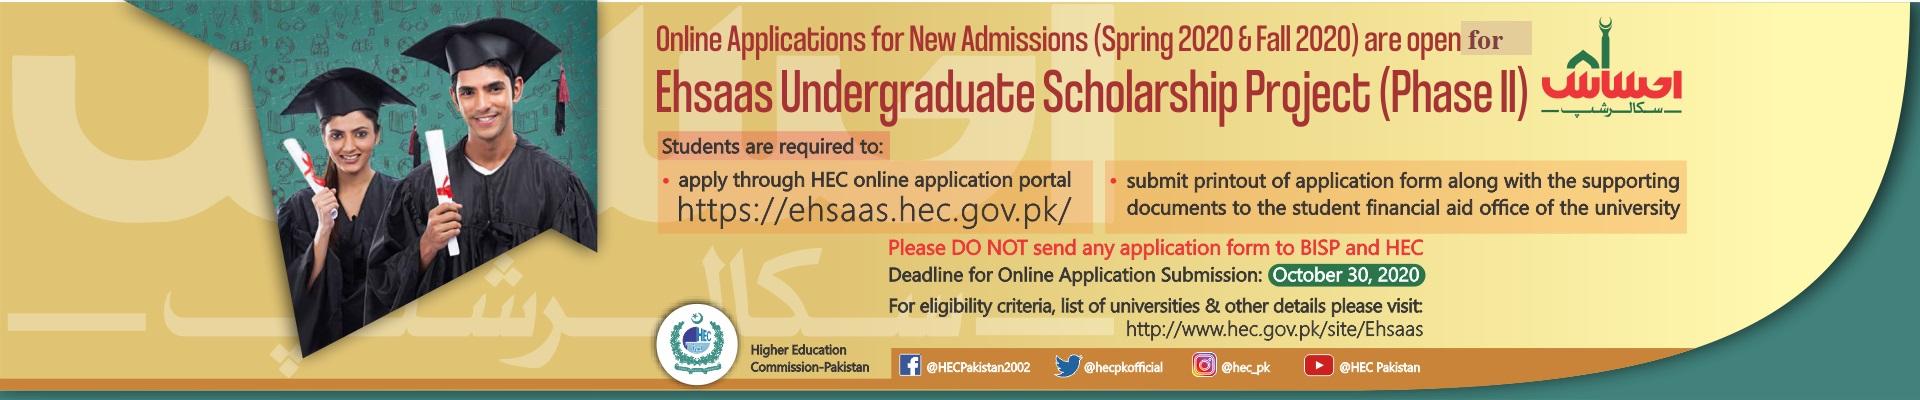 Ehsaas Undergraduate Scholarship Project Phase II